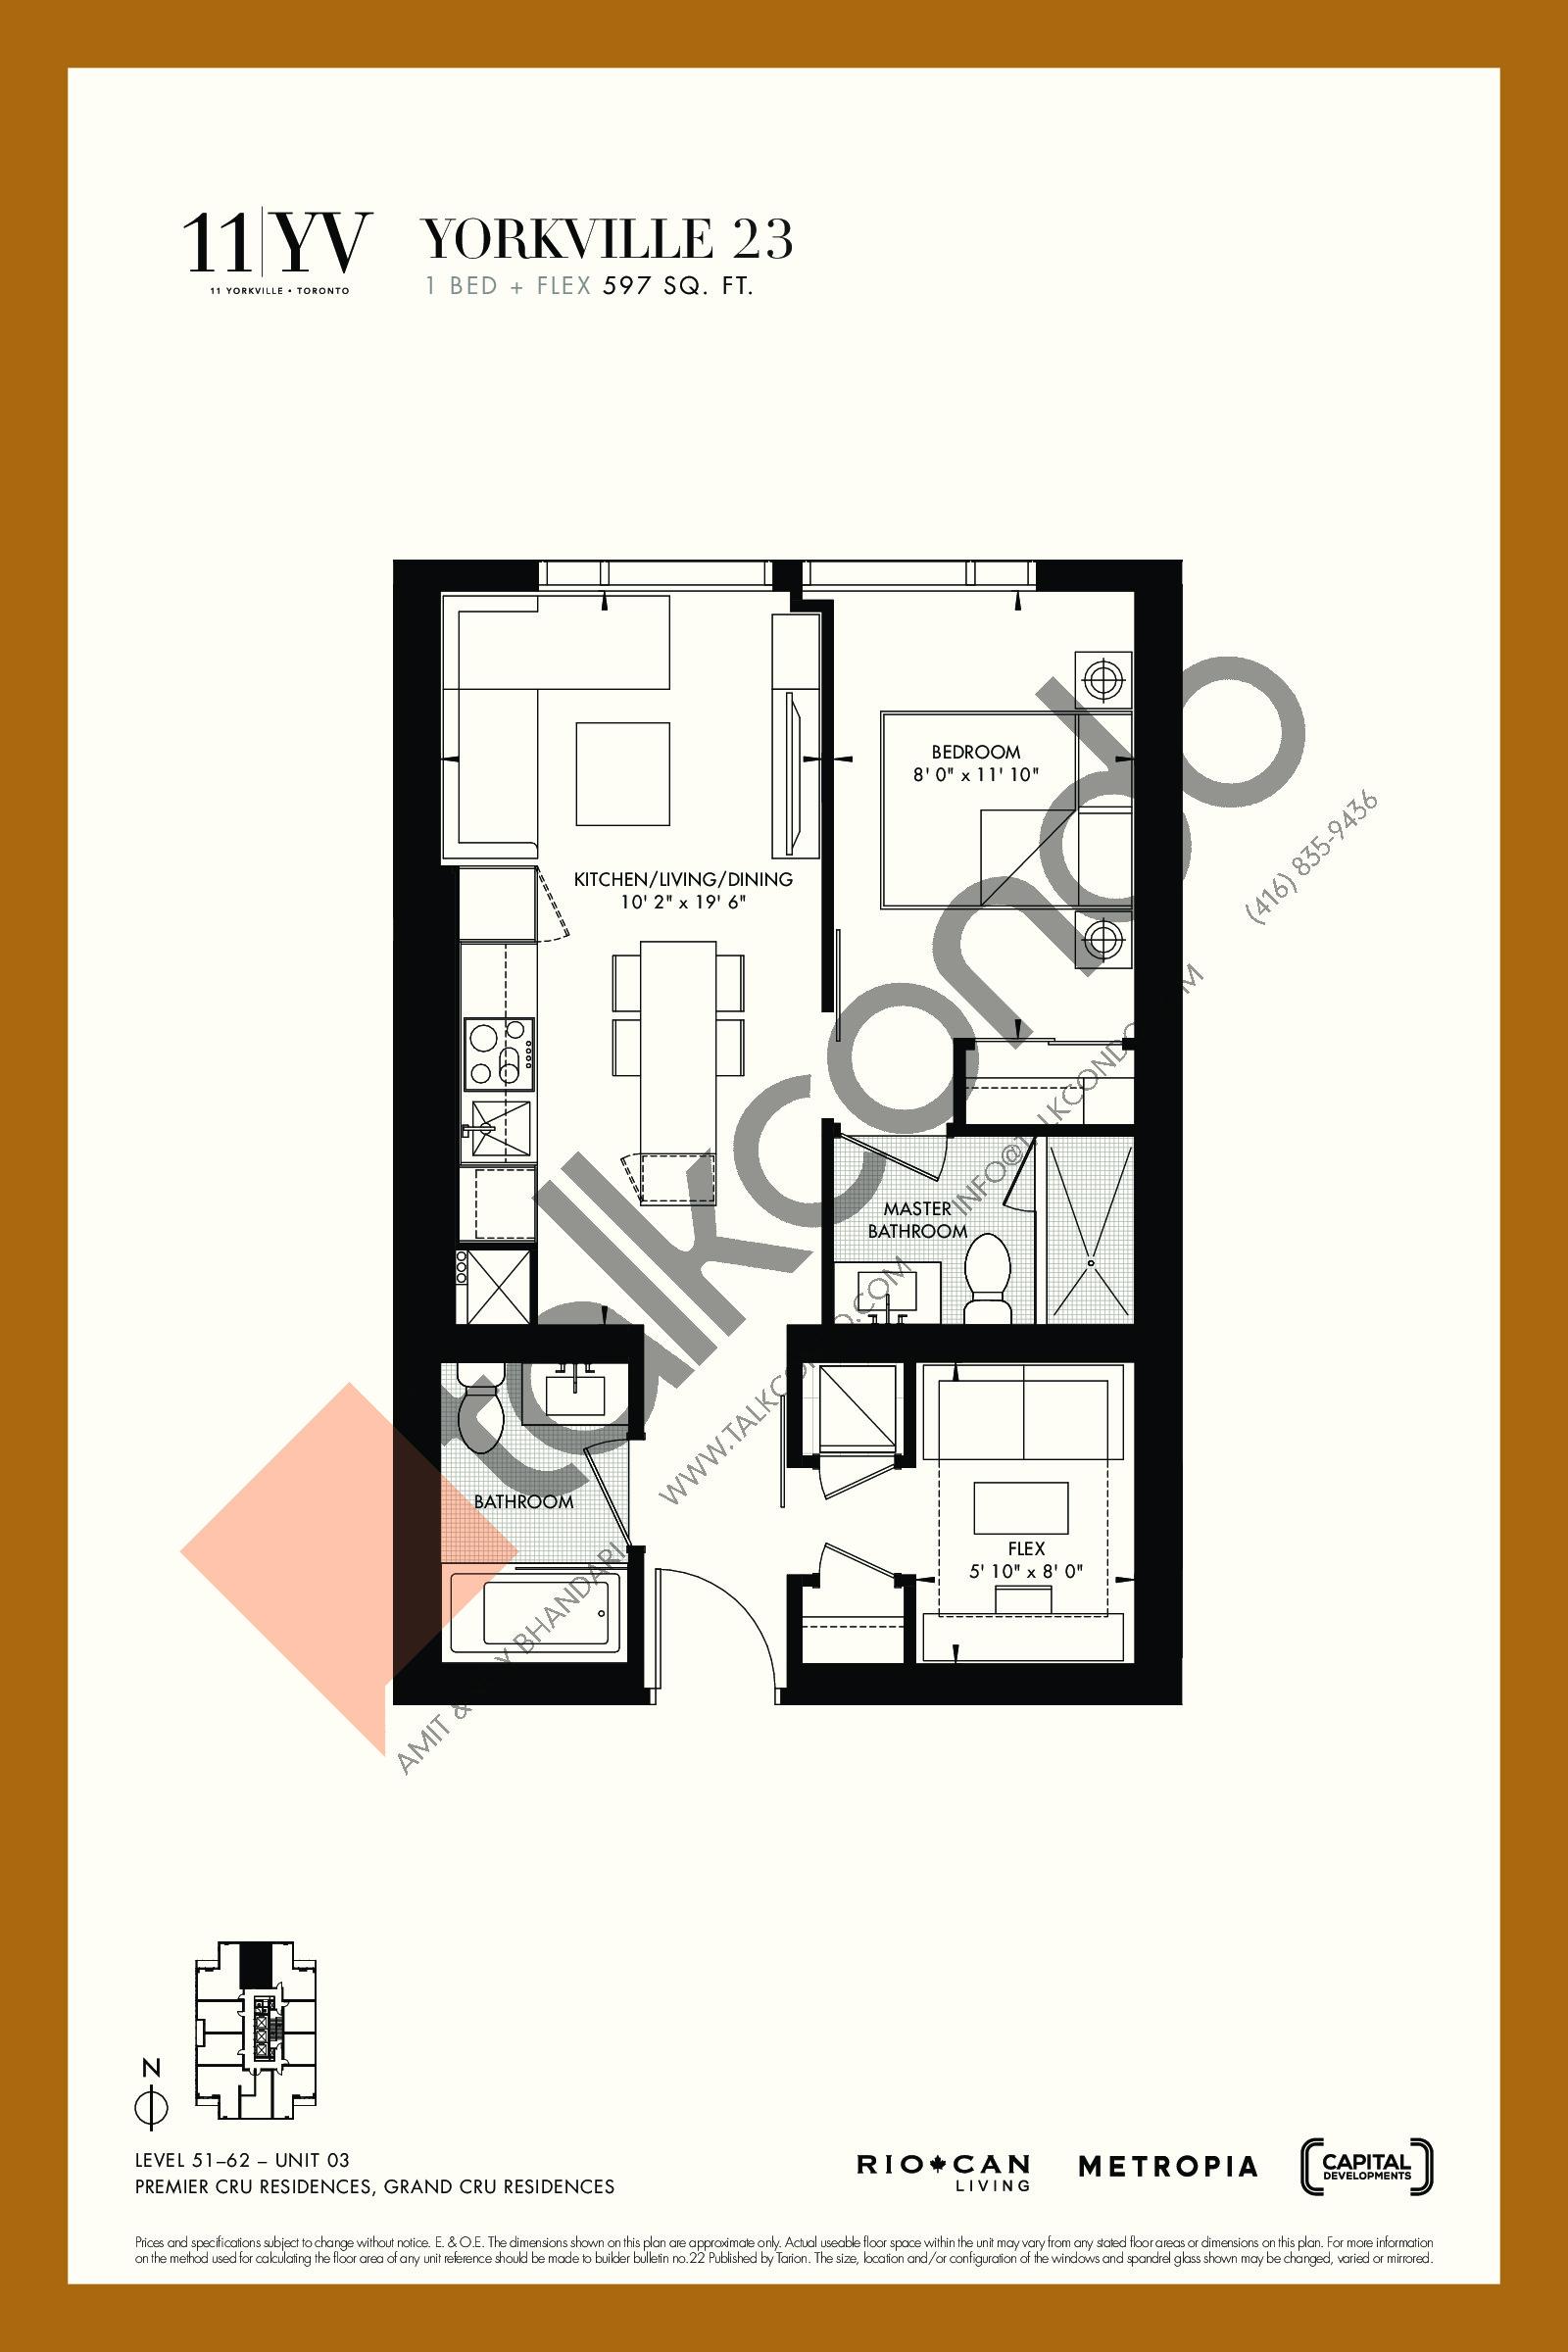 Yorkville 23 Floor Plan at 11YV Condos - 597 sq.ft